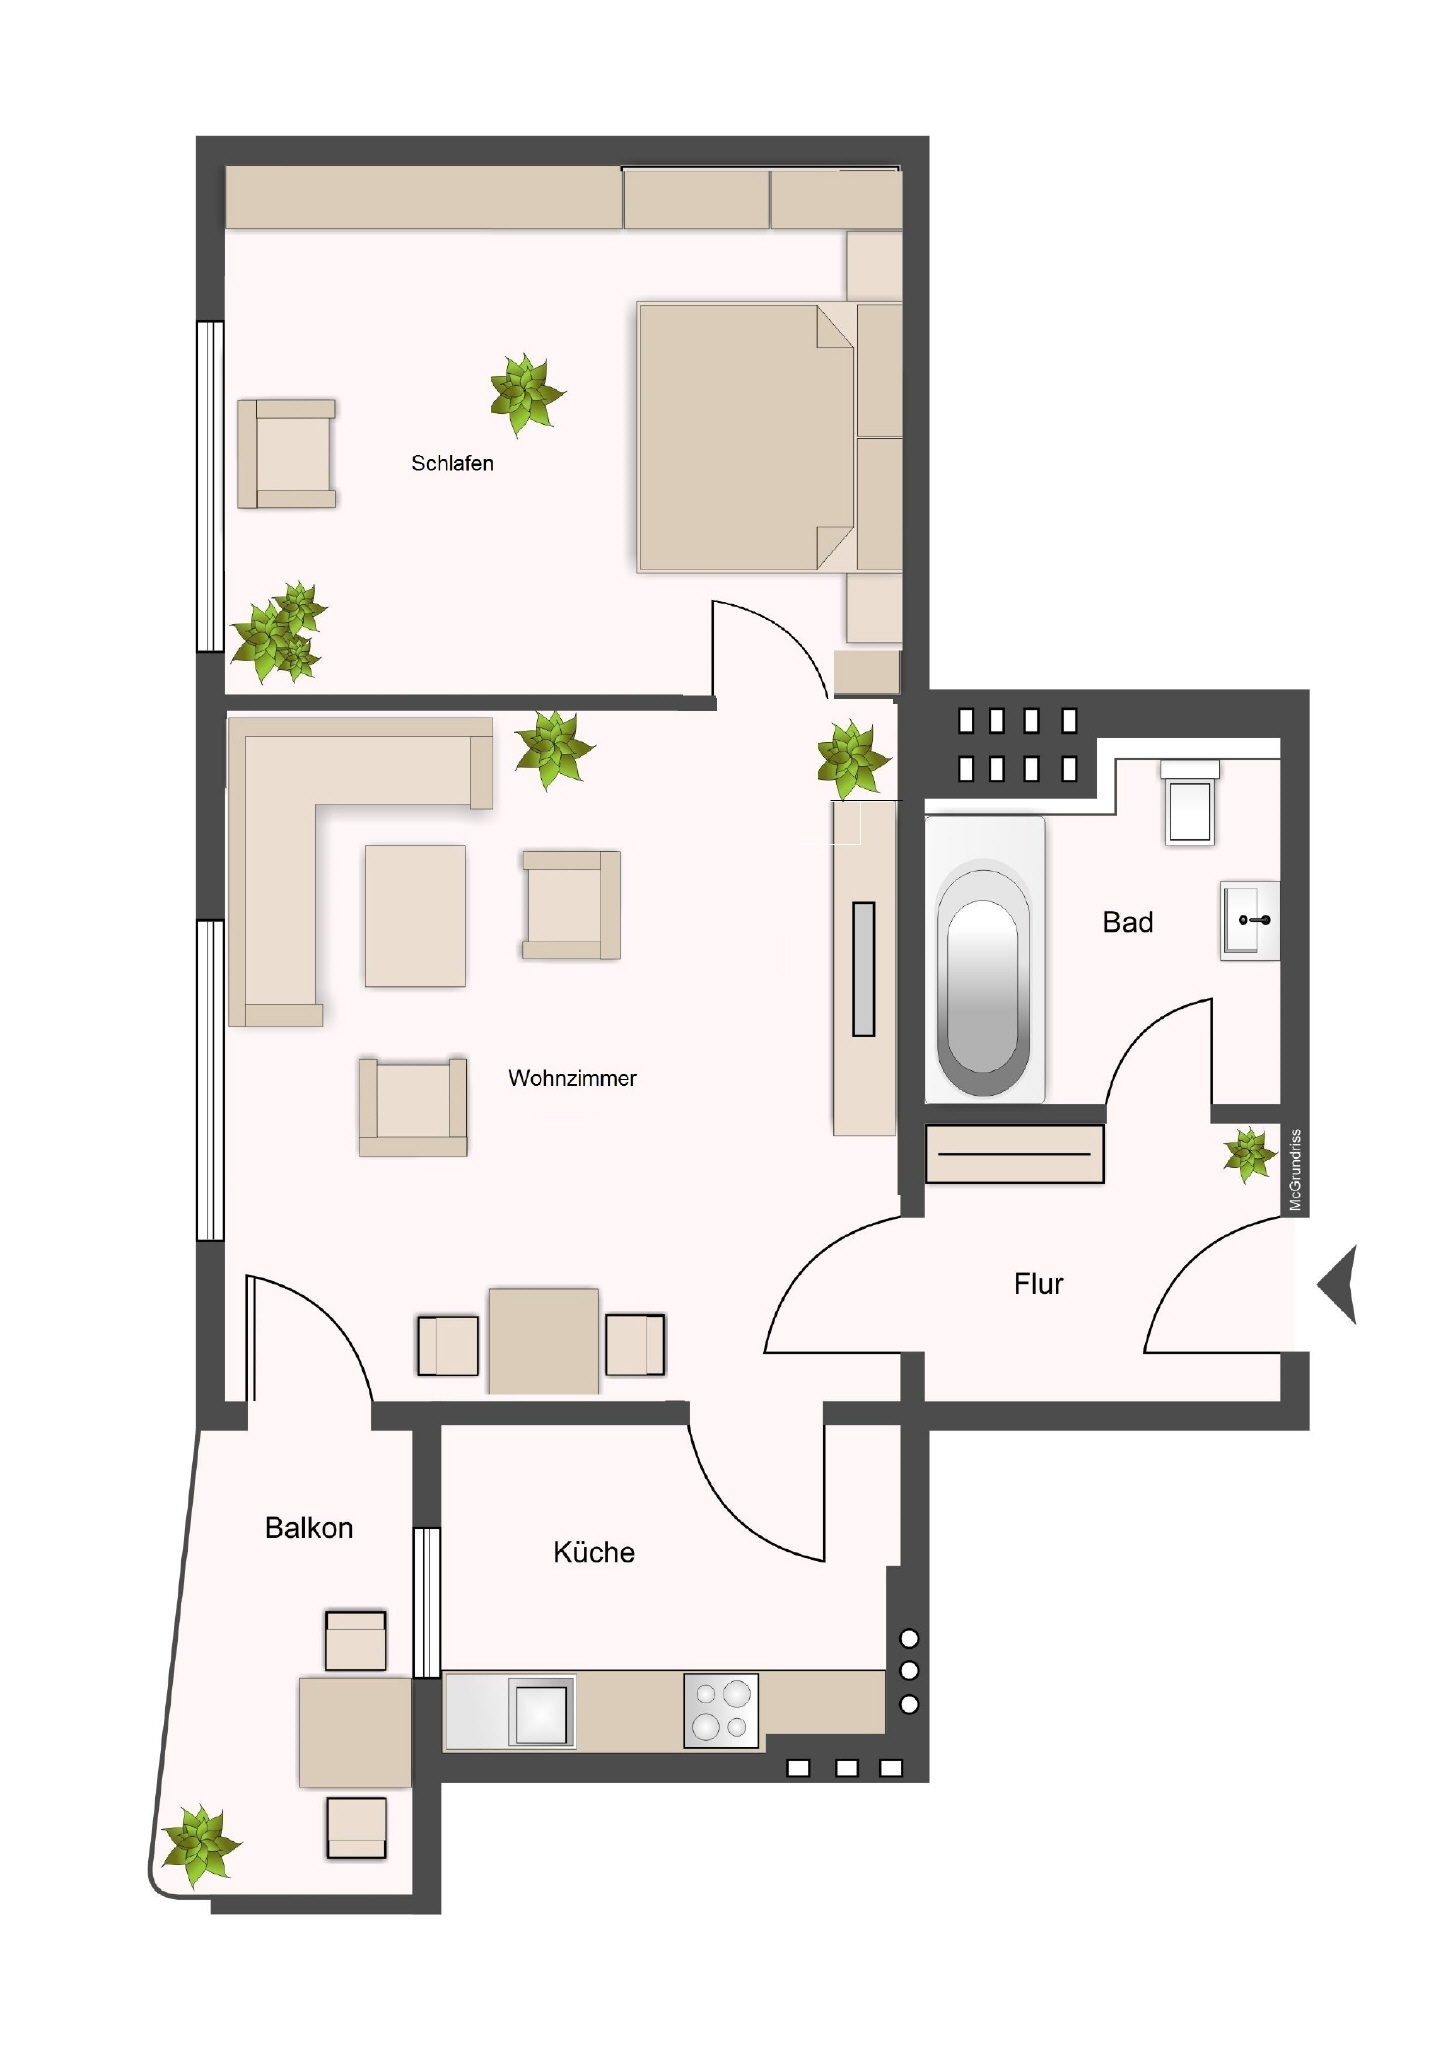 ideale paarwhg sucht neuen mieter dr schorn immobilien m nster. Black Bedroom Furniture Sets. Home Design Ideas